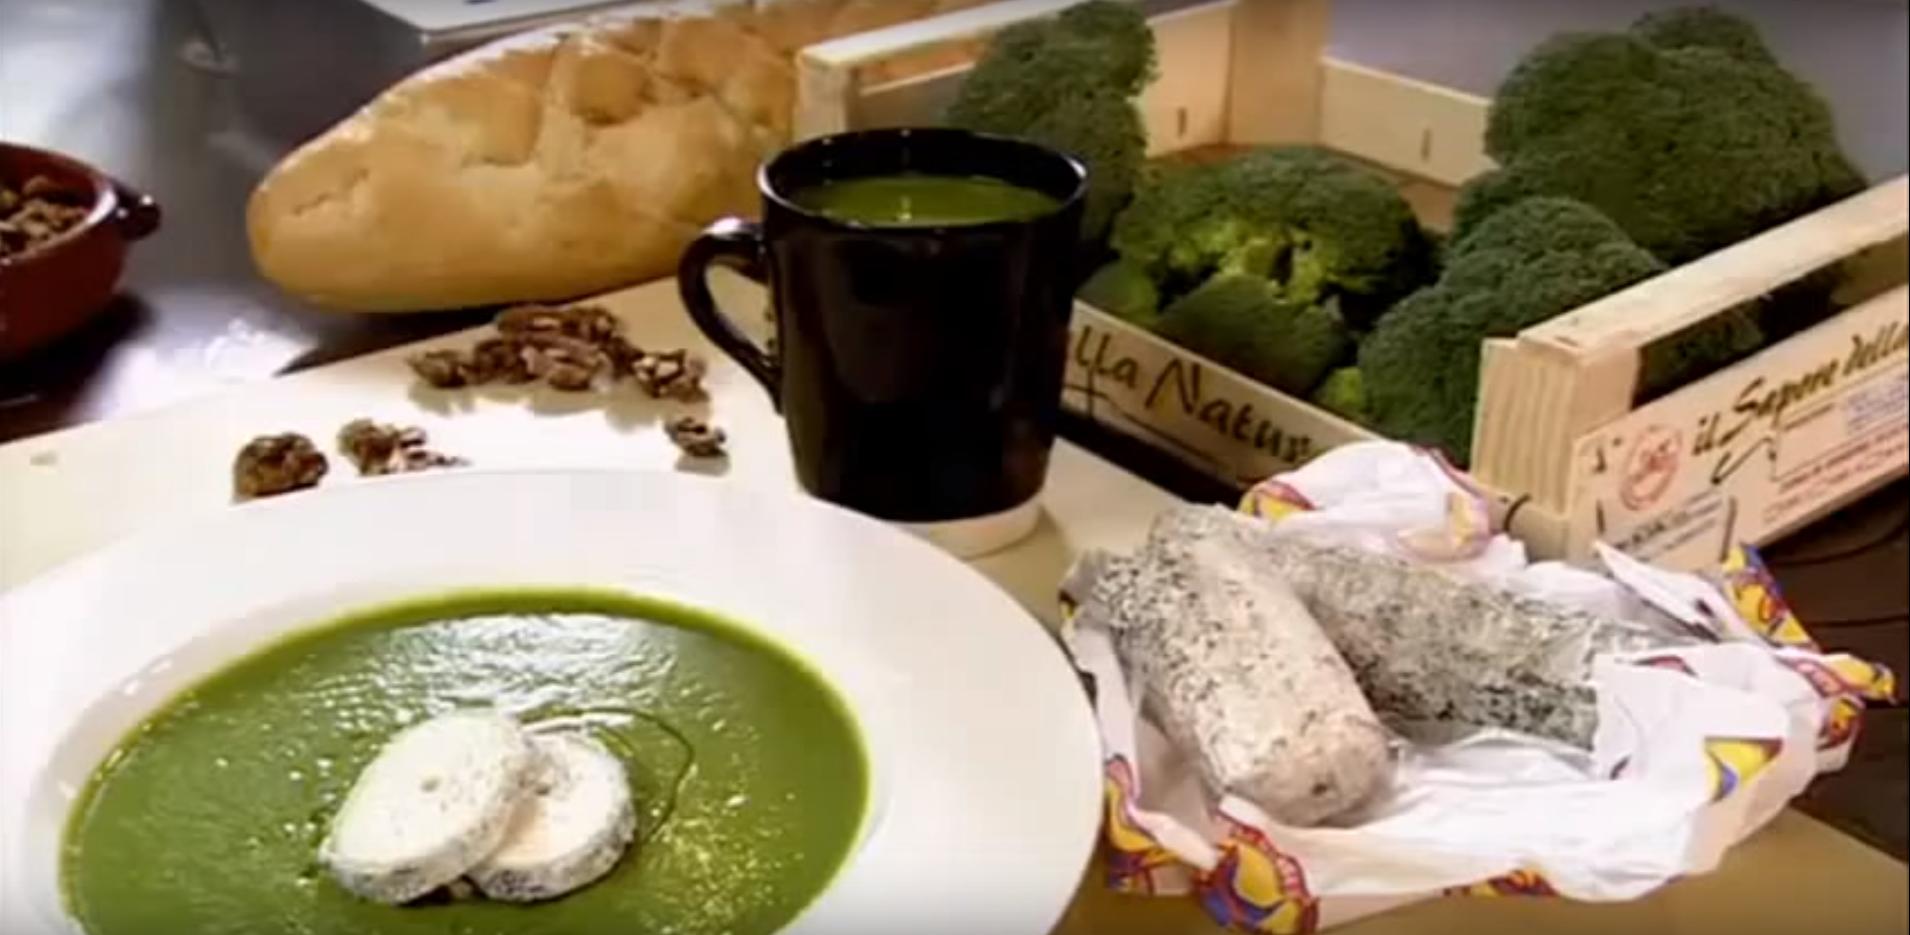 Gordon Ramsay - Brokkoli krémleves friss kecskesajttal